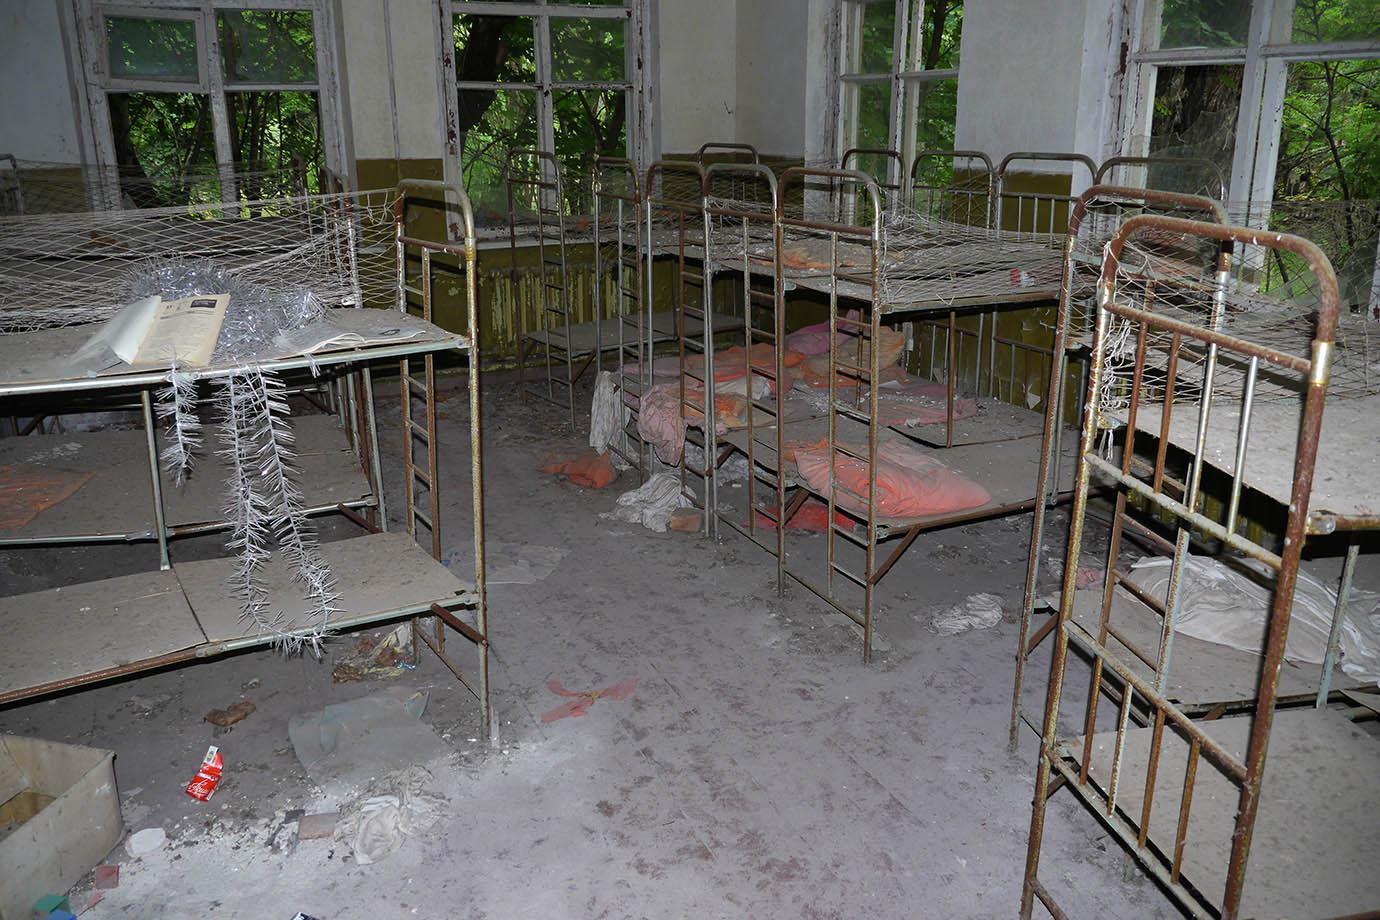 chernobyl-disaster14